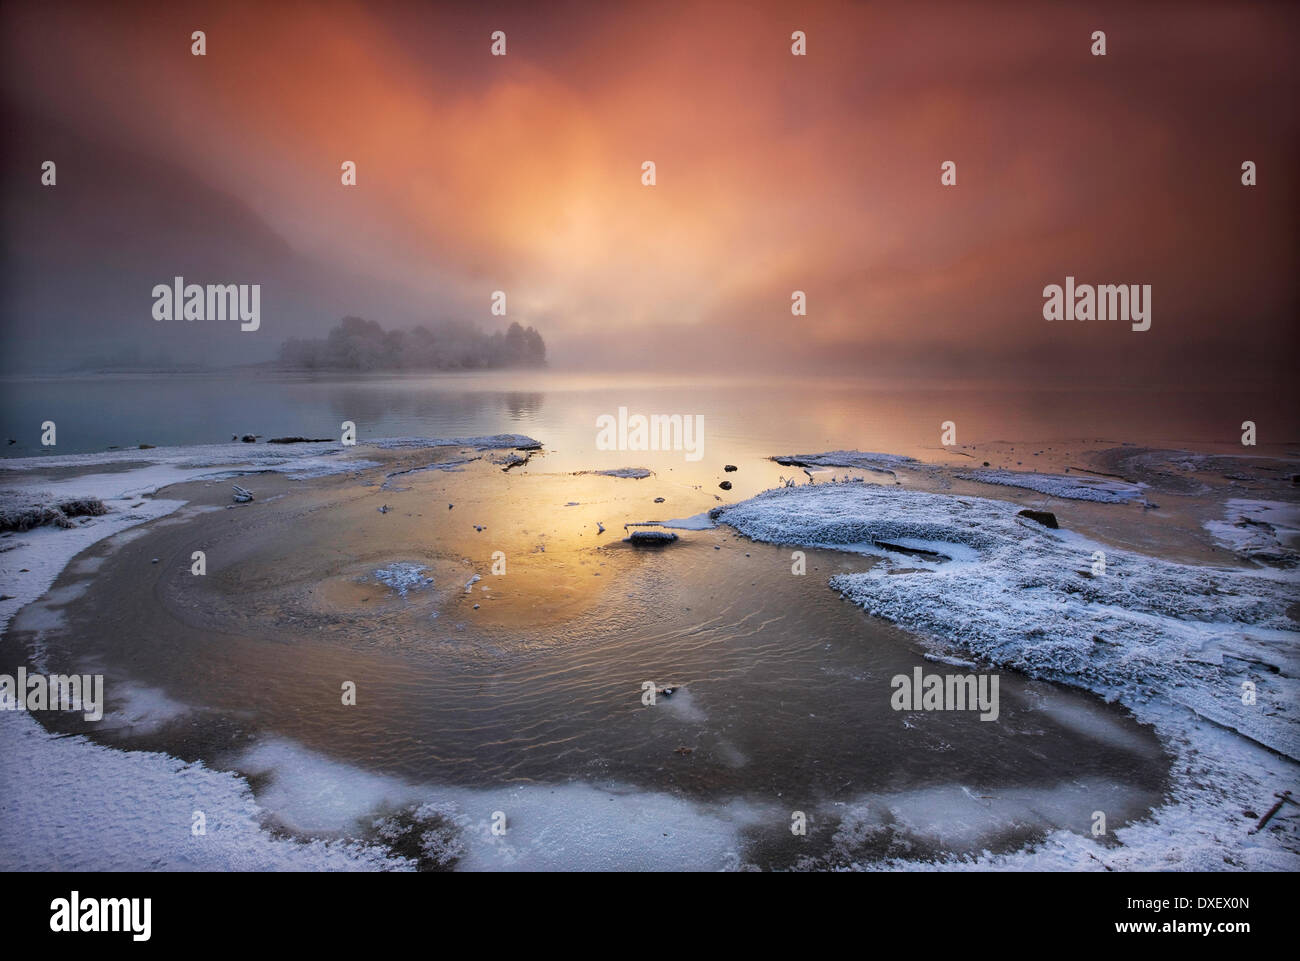 Dramatic sunset over Loch Shiel, Glenfinnan, Lochaber, Scottish Highlands. - Stock Image